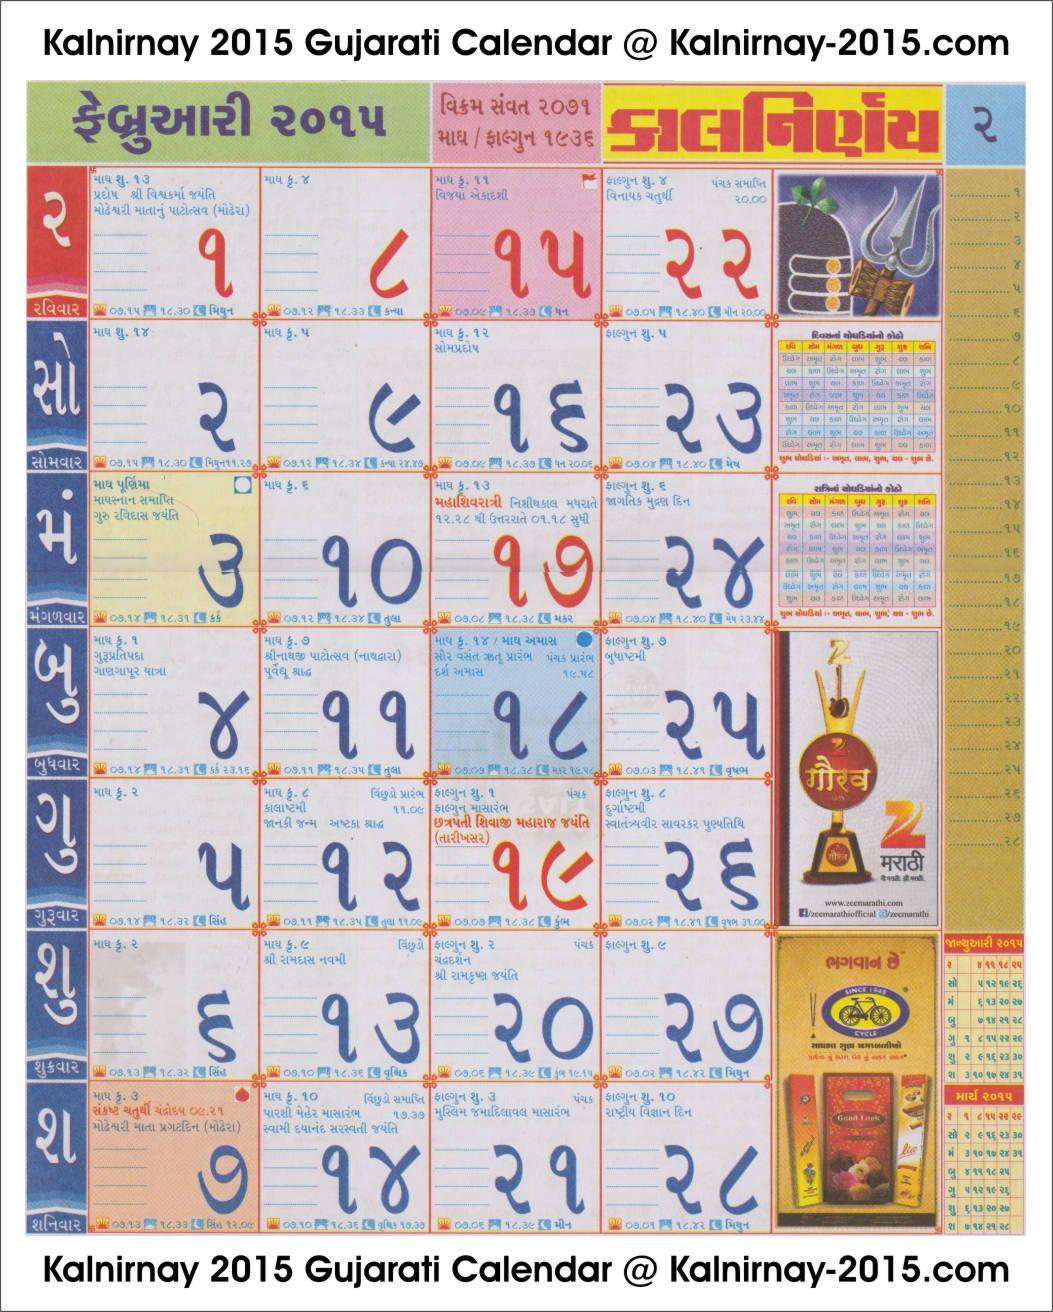 February 2015 Gujarati Kalnirnay Calendar | 2015 Kalnirnay ...